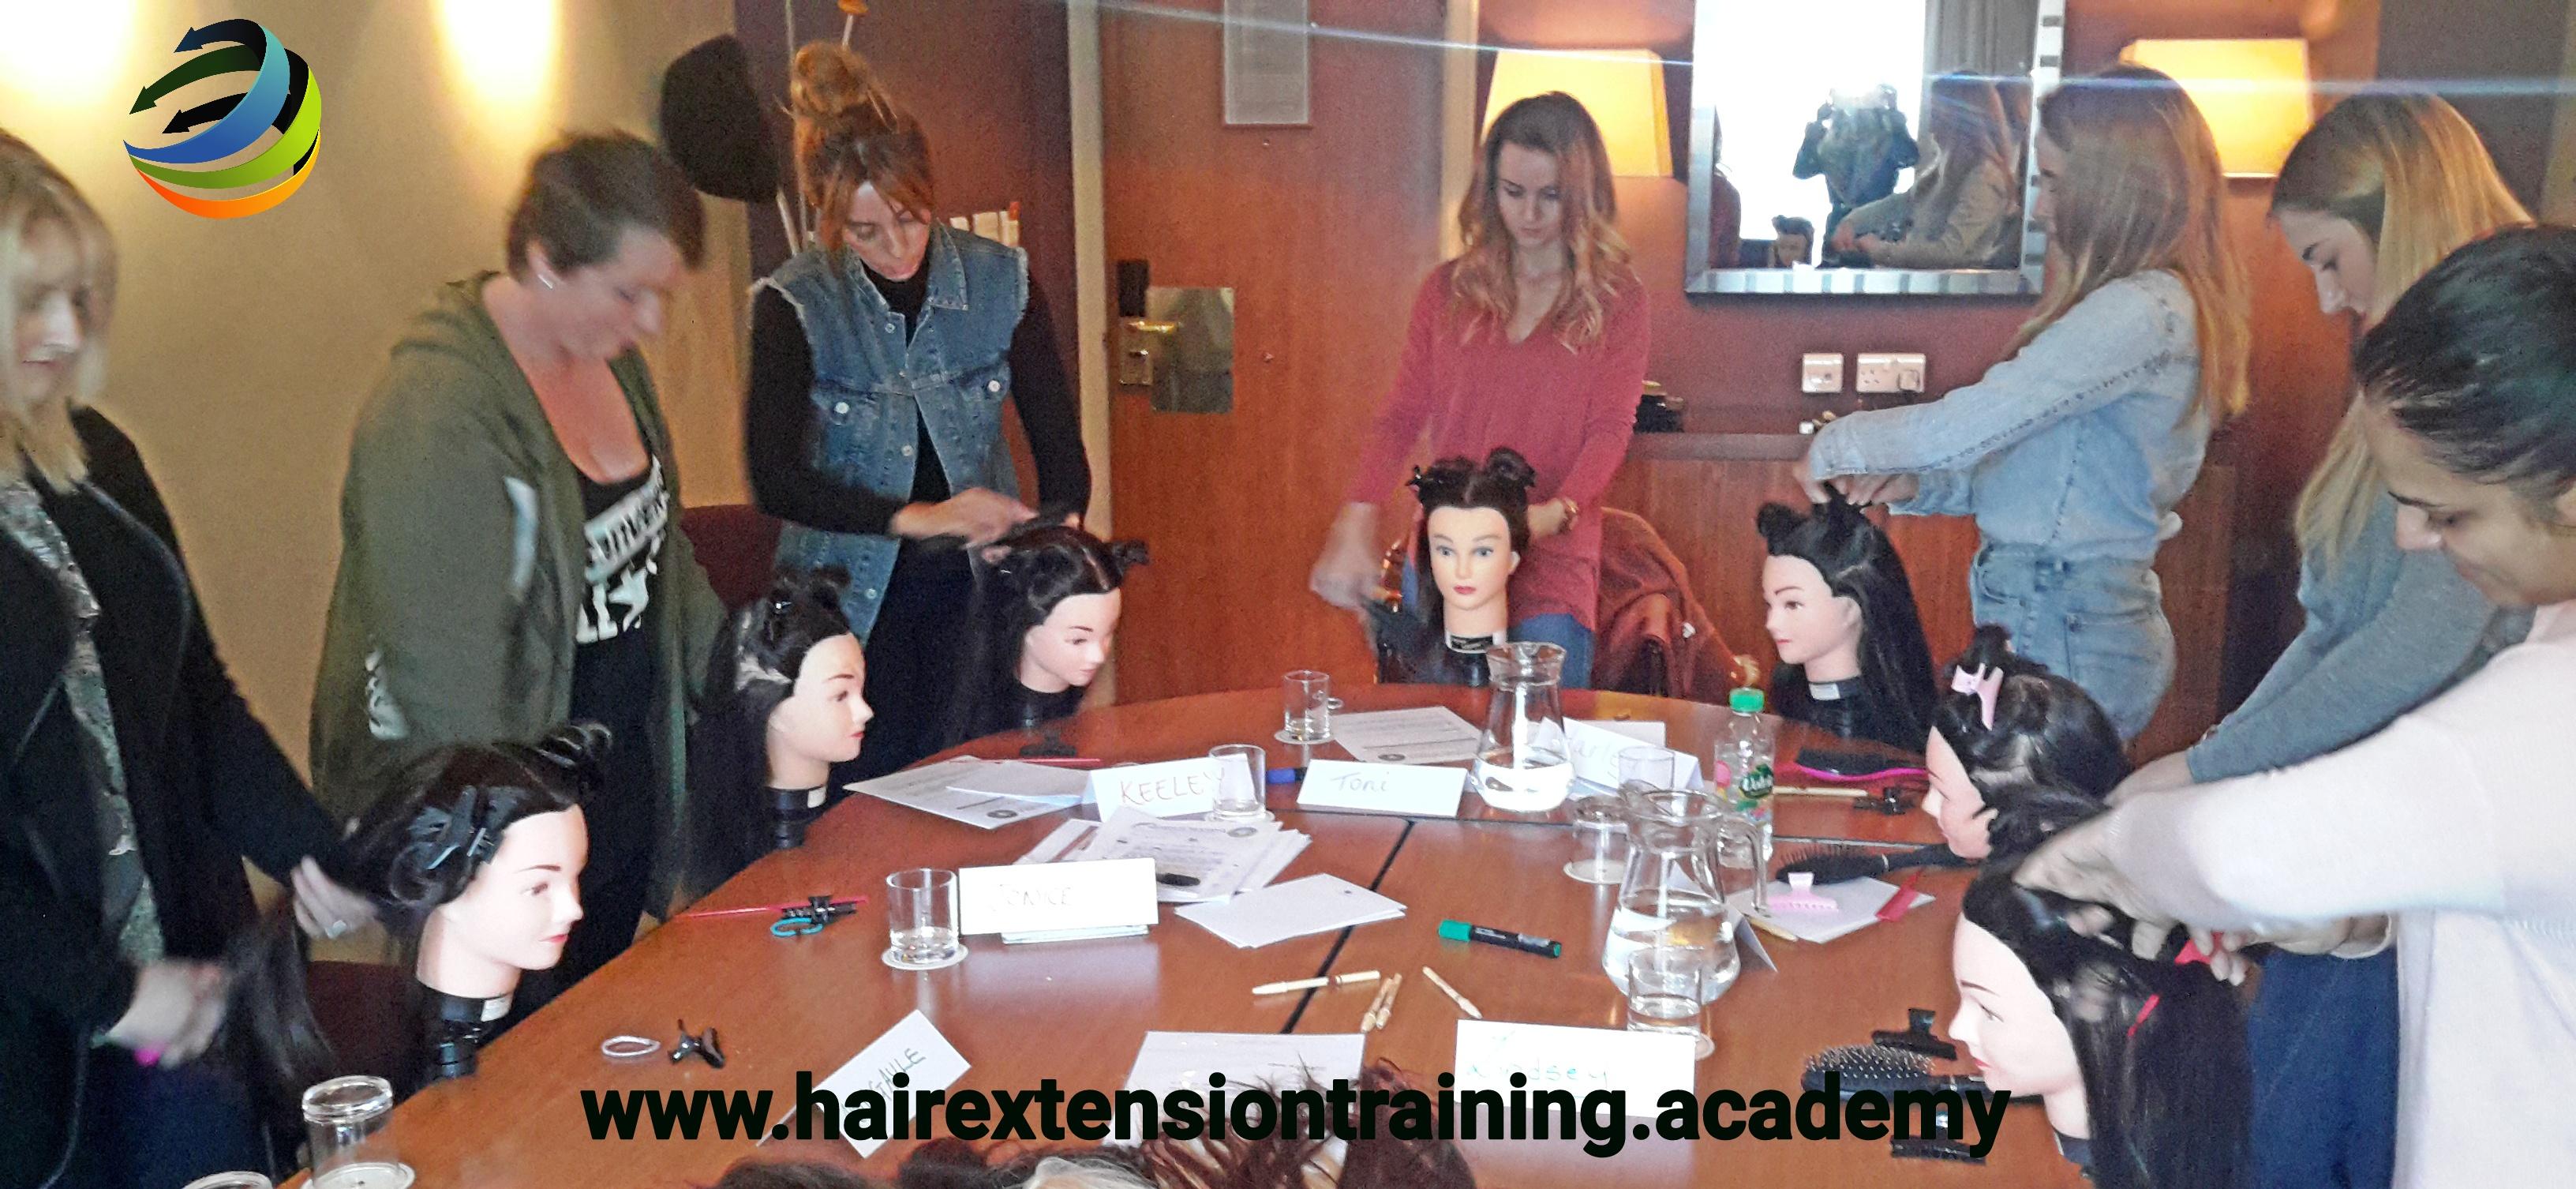 9  hair extension training academy diane shawe